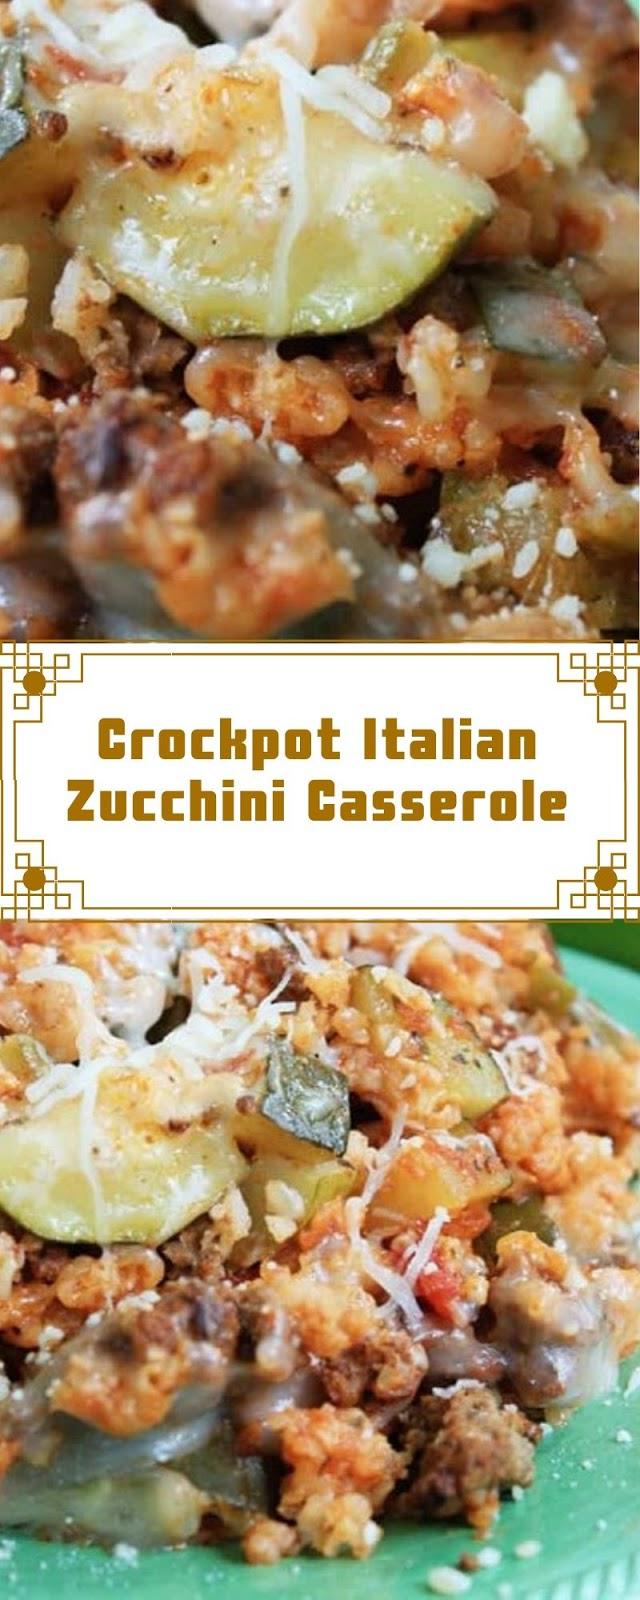 Crockpot Italian Zucchini Casserole